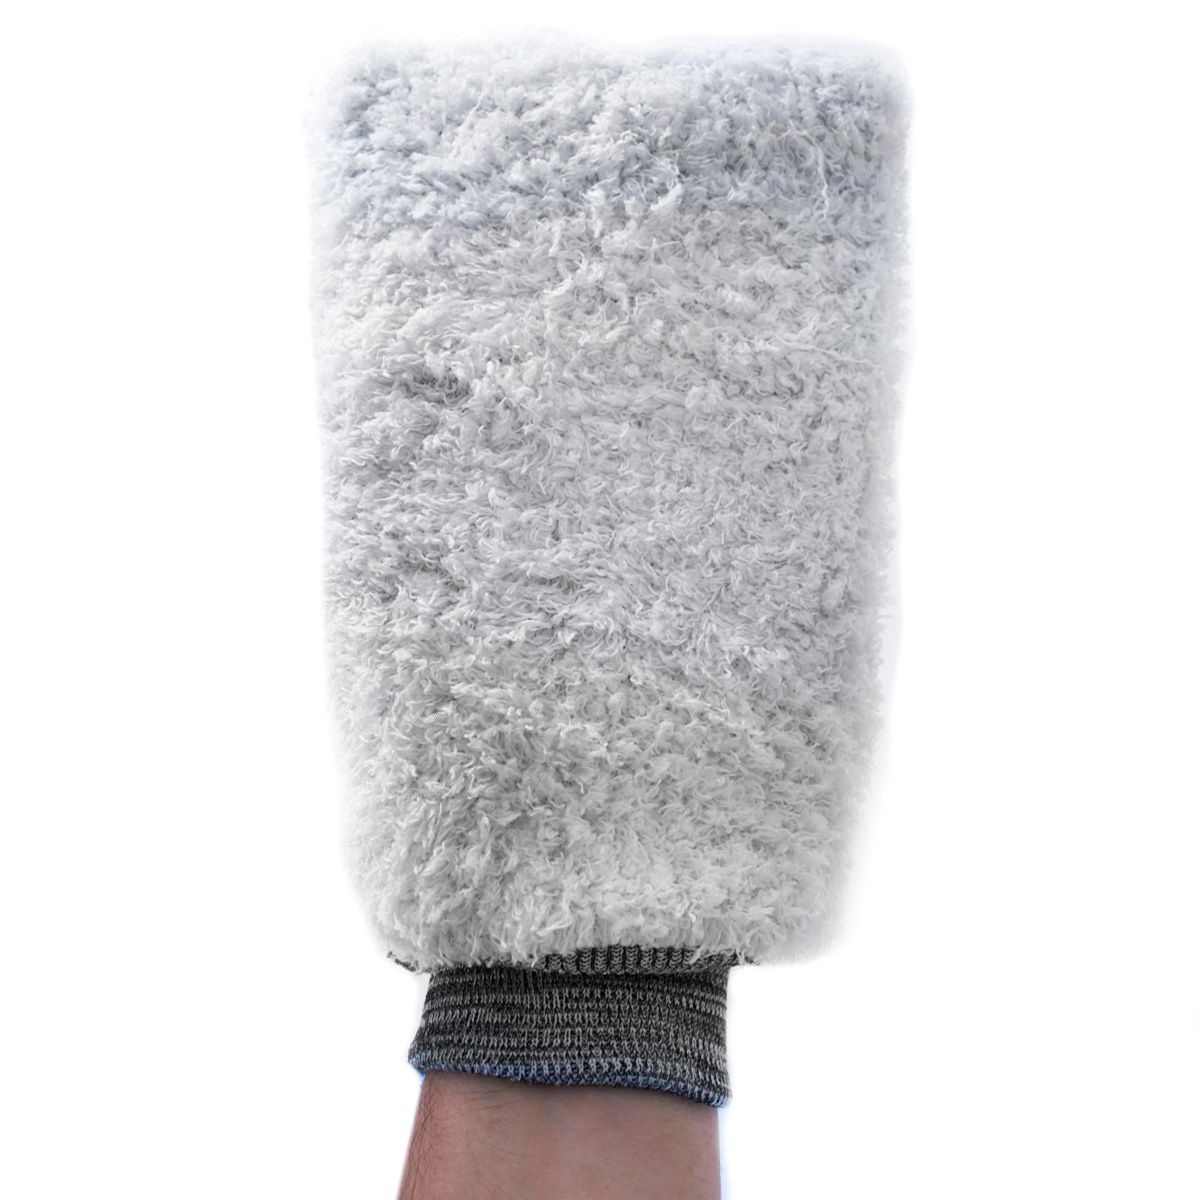 Luva de Microfibra Powerful Branca - Detailer  - Loja Go Eco Wash